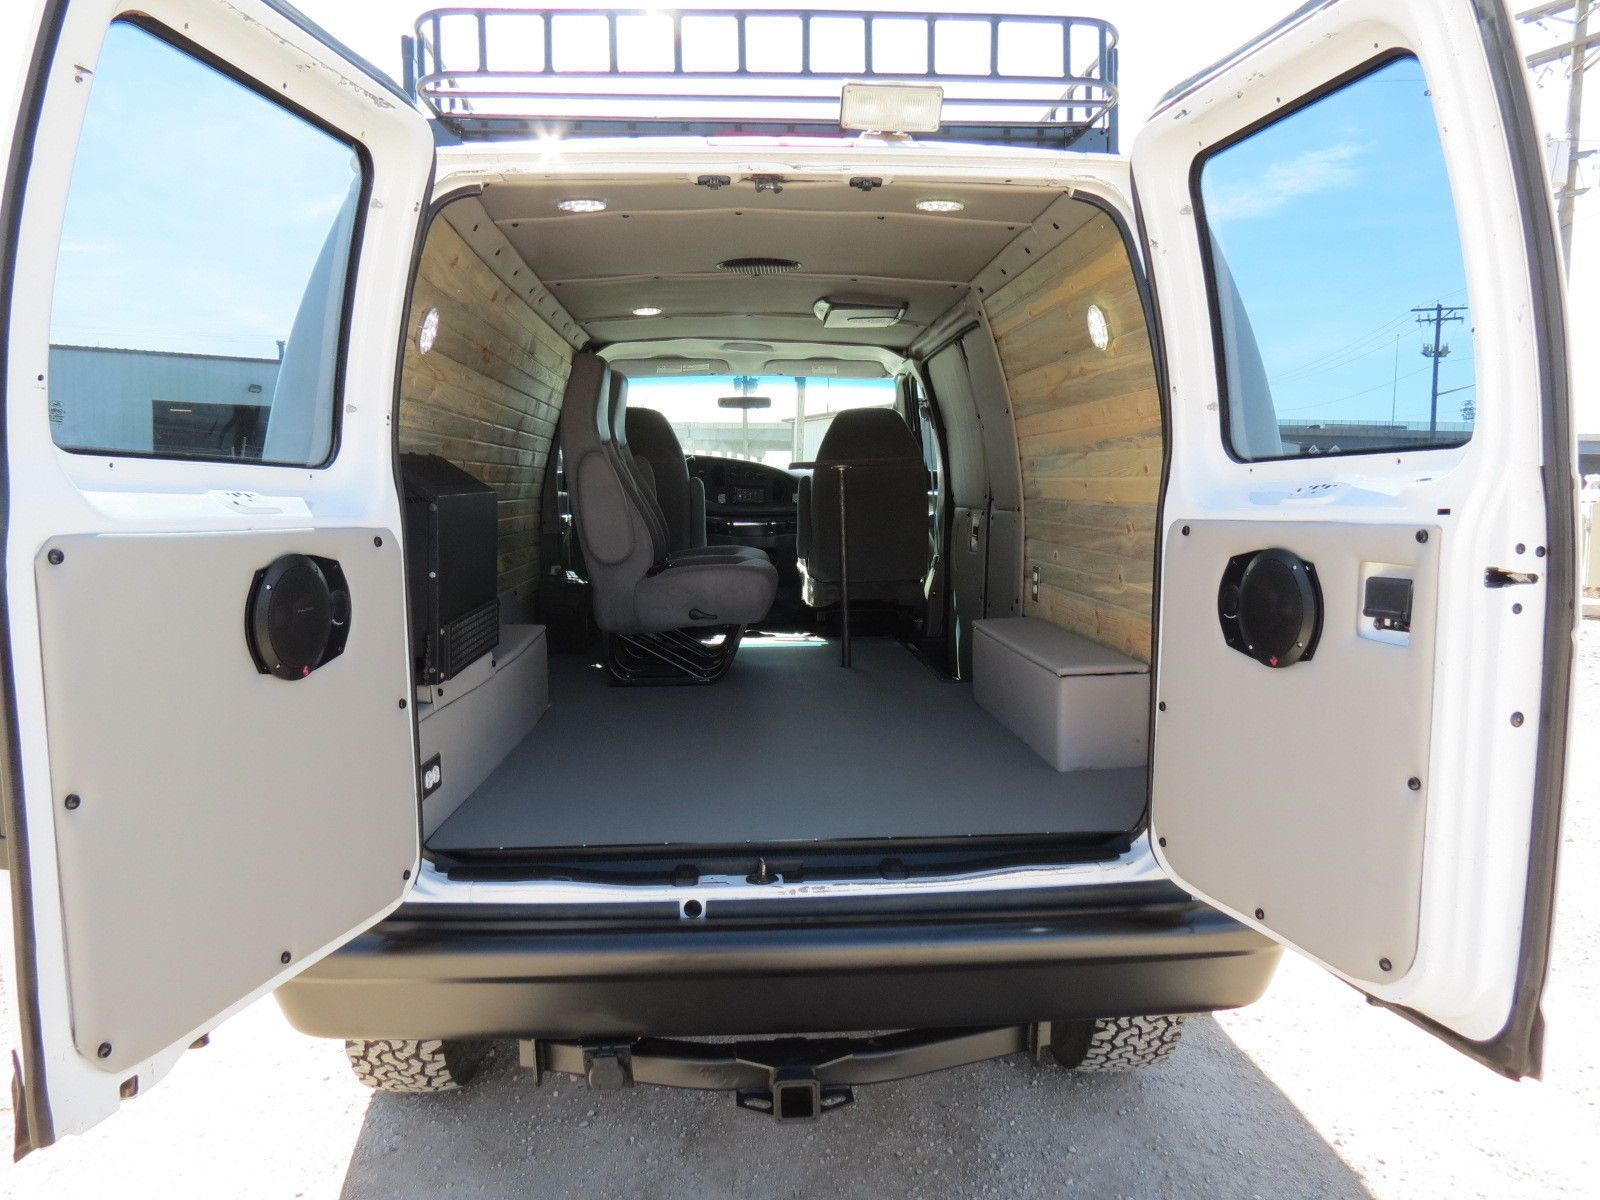 1996 ford conversion van interior